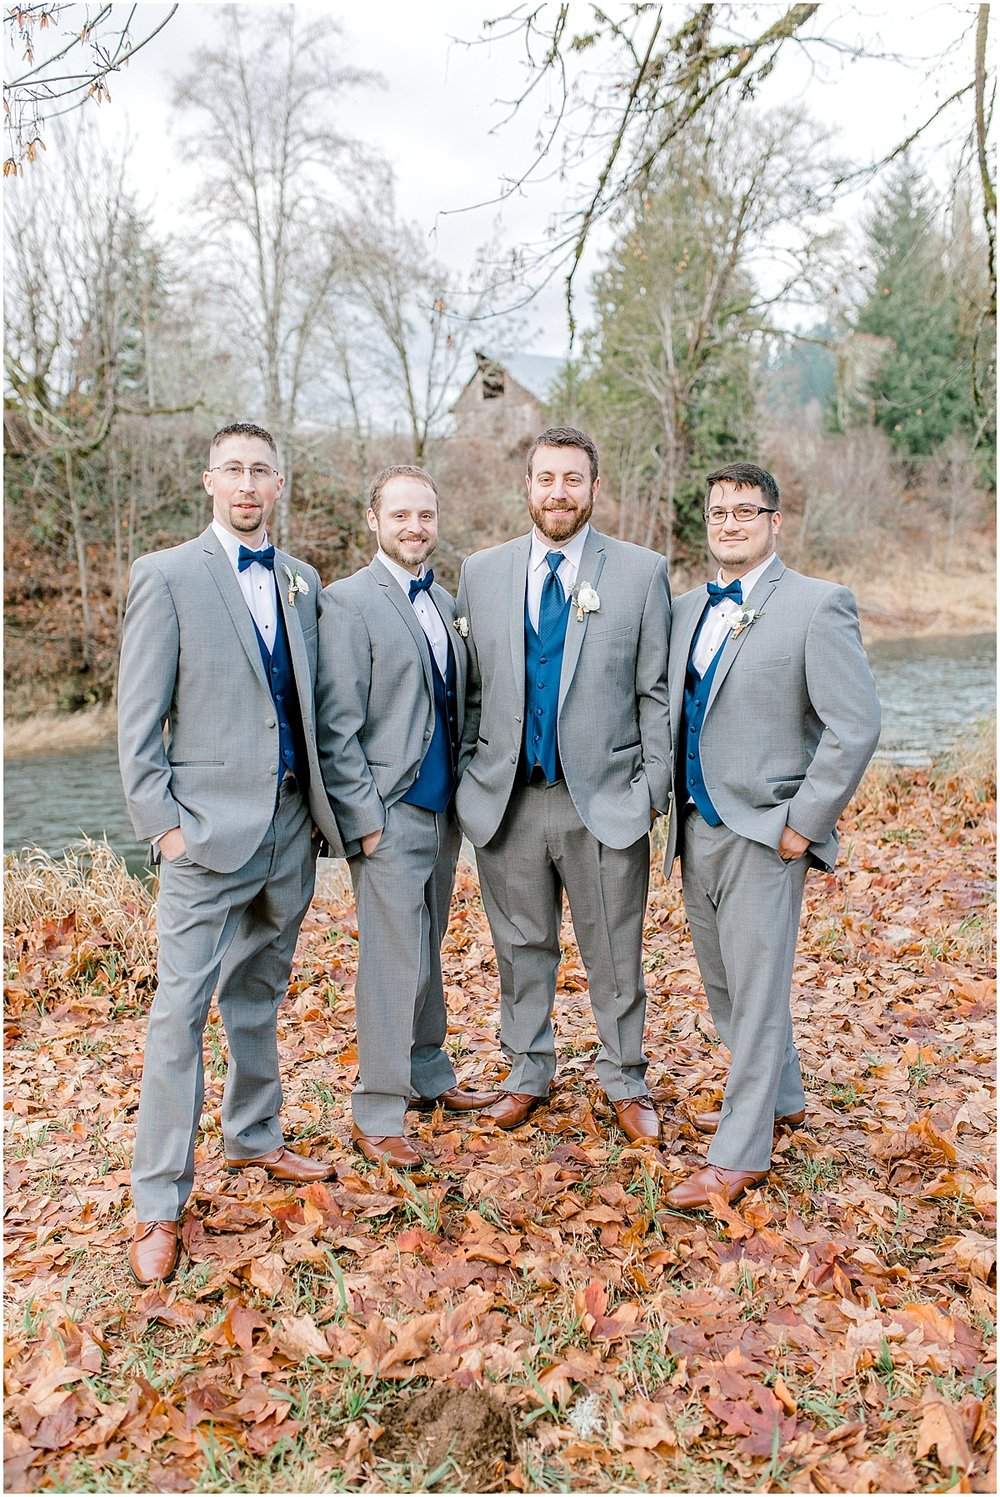 Chehalis Washington Winter Wedding Silver and White | Willapa Hills Farm Wedding | Eastham | Emma Rose Company PNW Light and Airy Wedding Photographer_0029.jpg